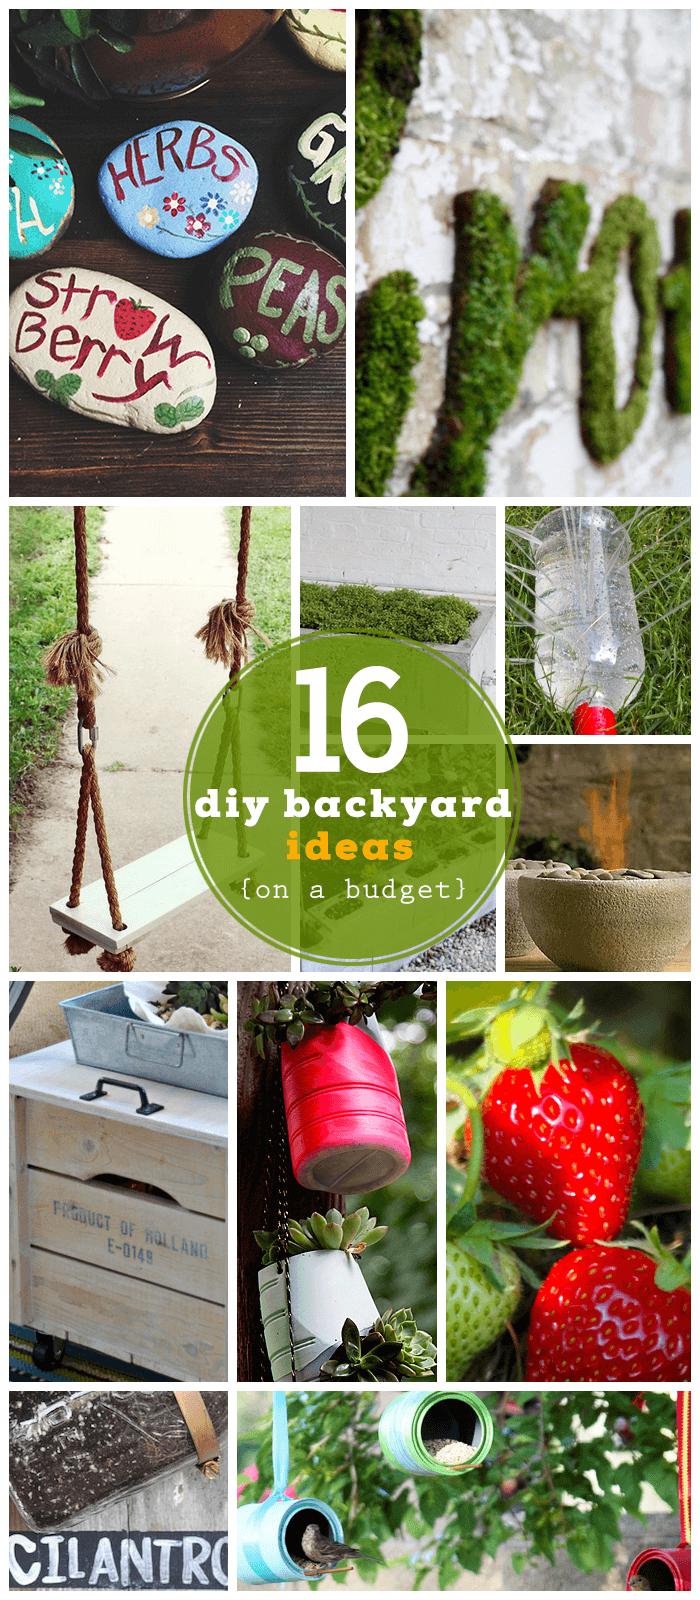 20 genius diy garden ideas on a budget gardens garden ideas and kid